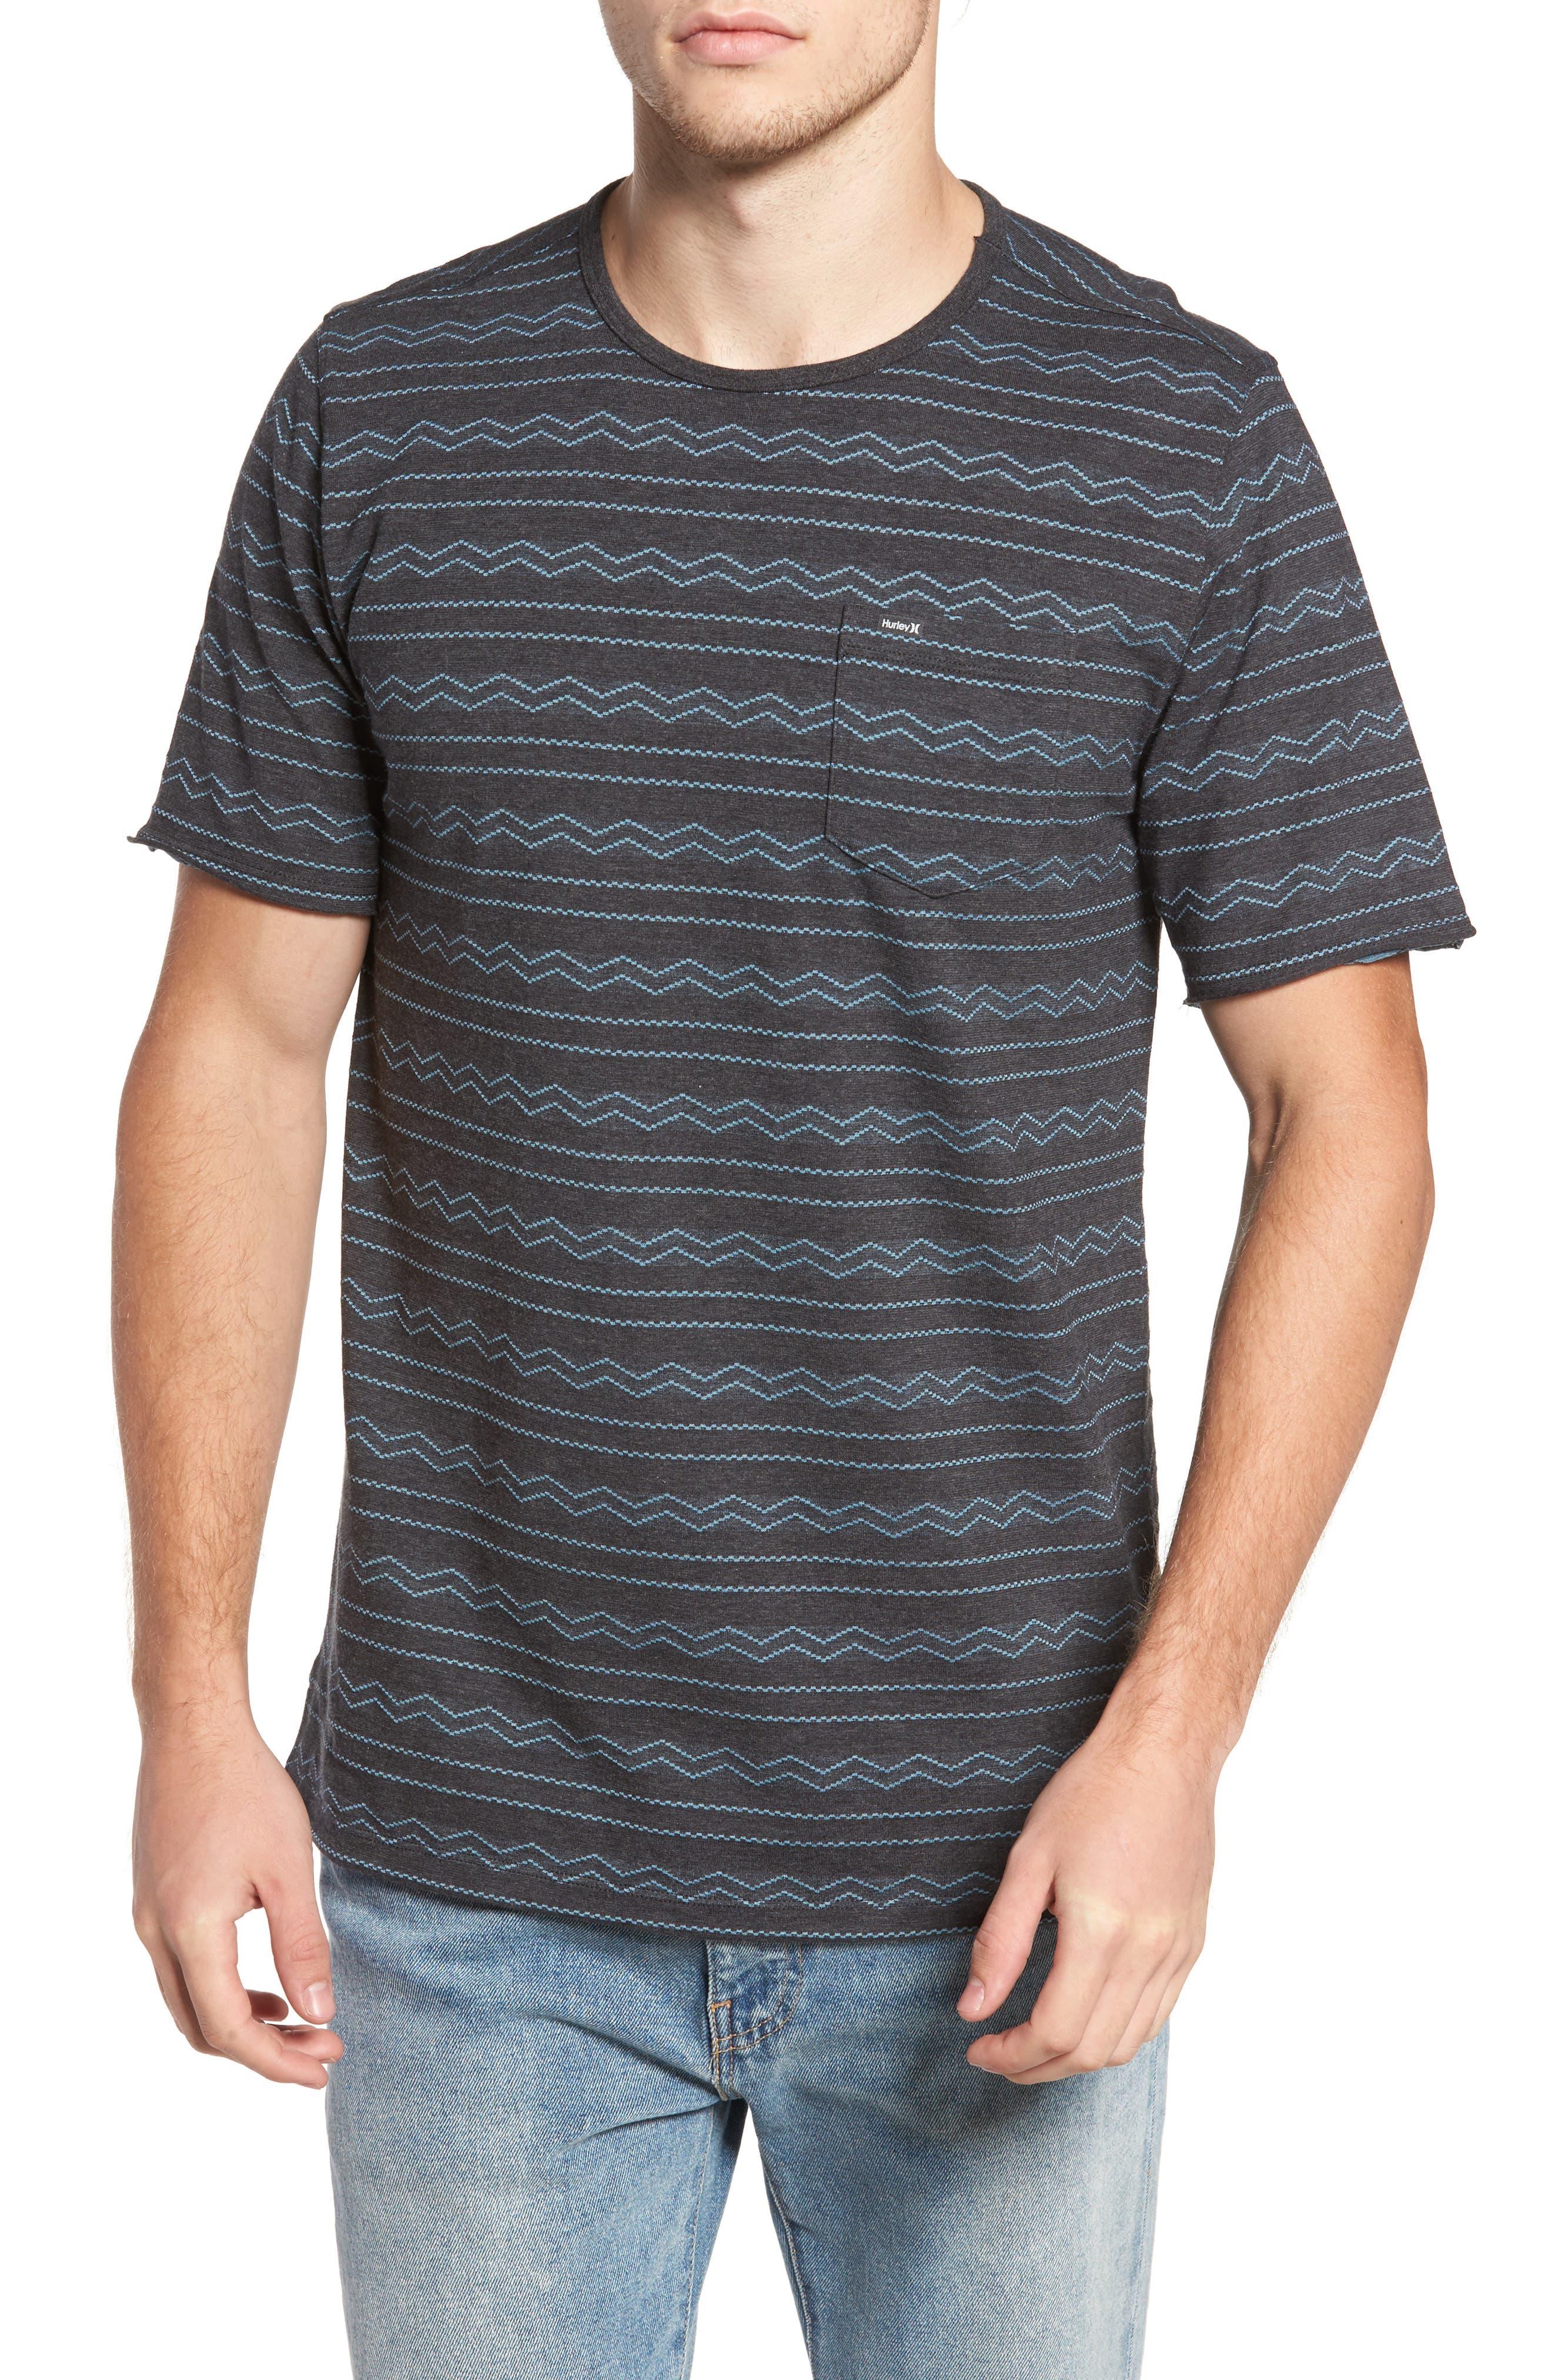 Pismo Dri-FIT T-Shirt,                             Main thumbnail 1, color,                             007